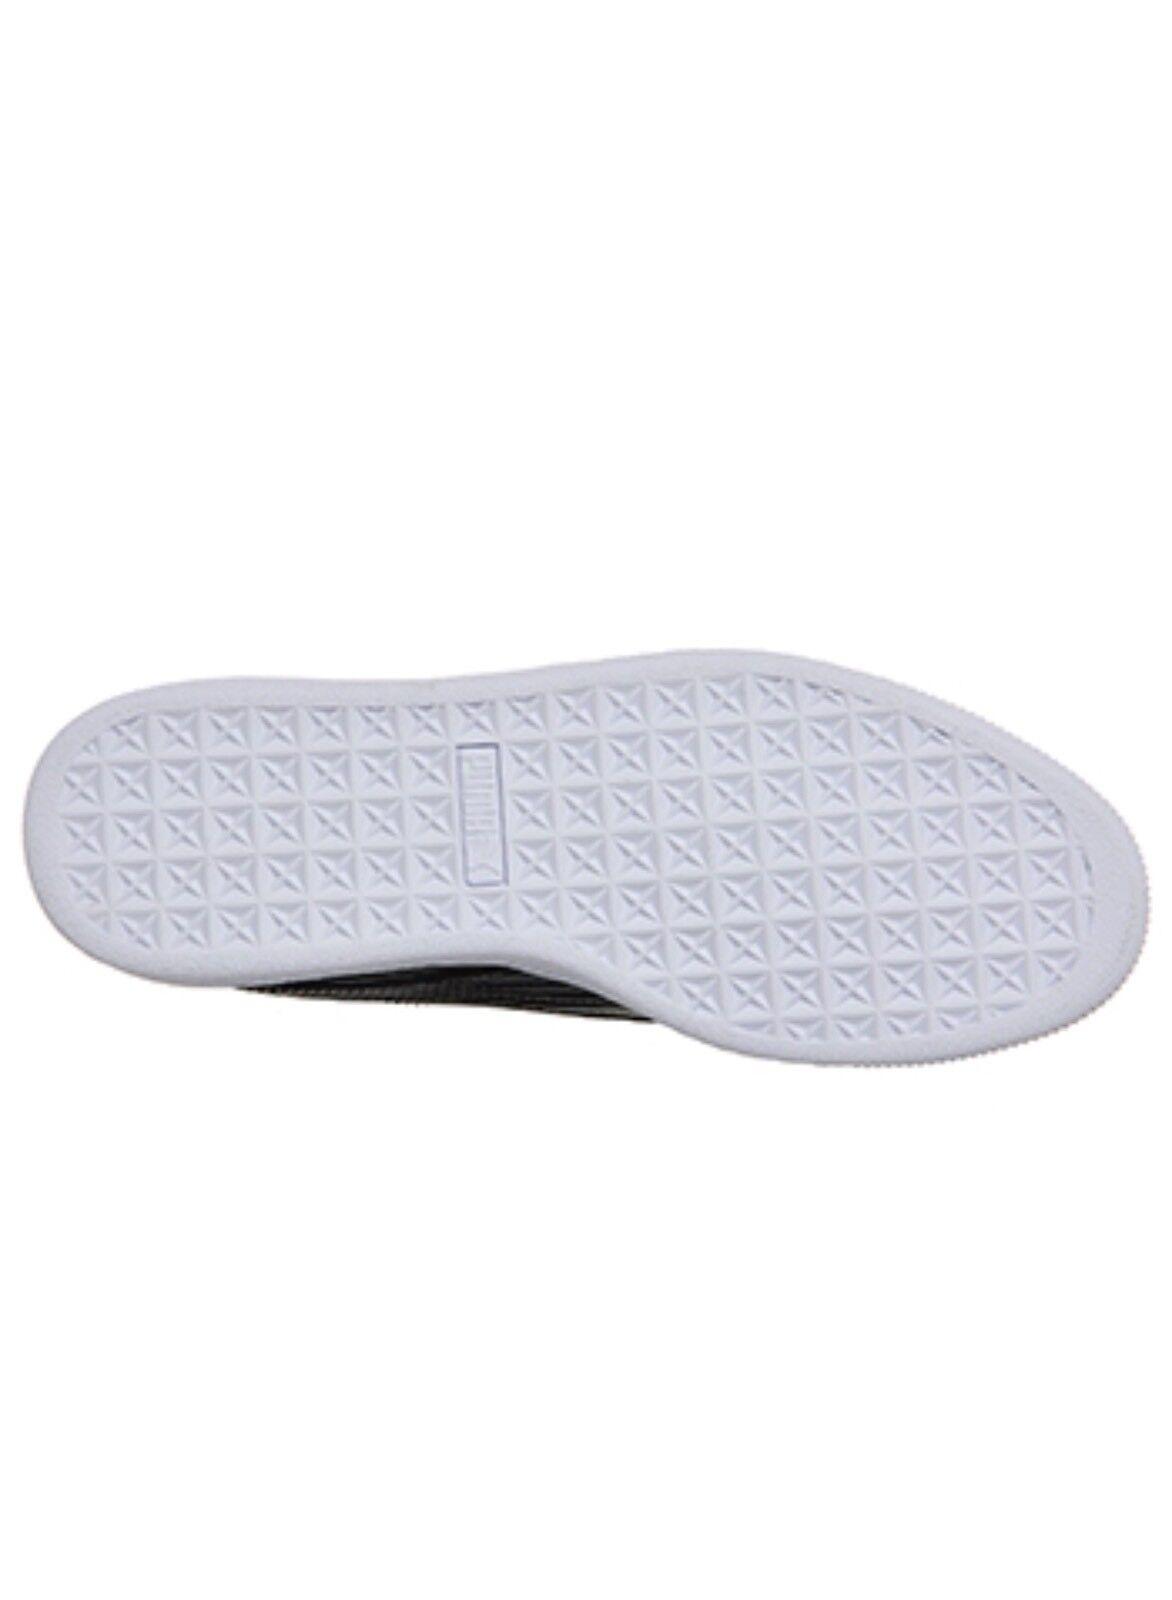 PUMA Basket Was Heart Patent Damenschuhe Schuhes    Was Basket  Now Only d79e9a